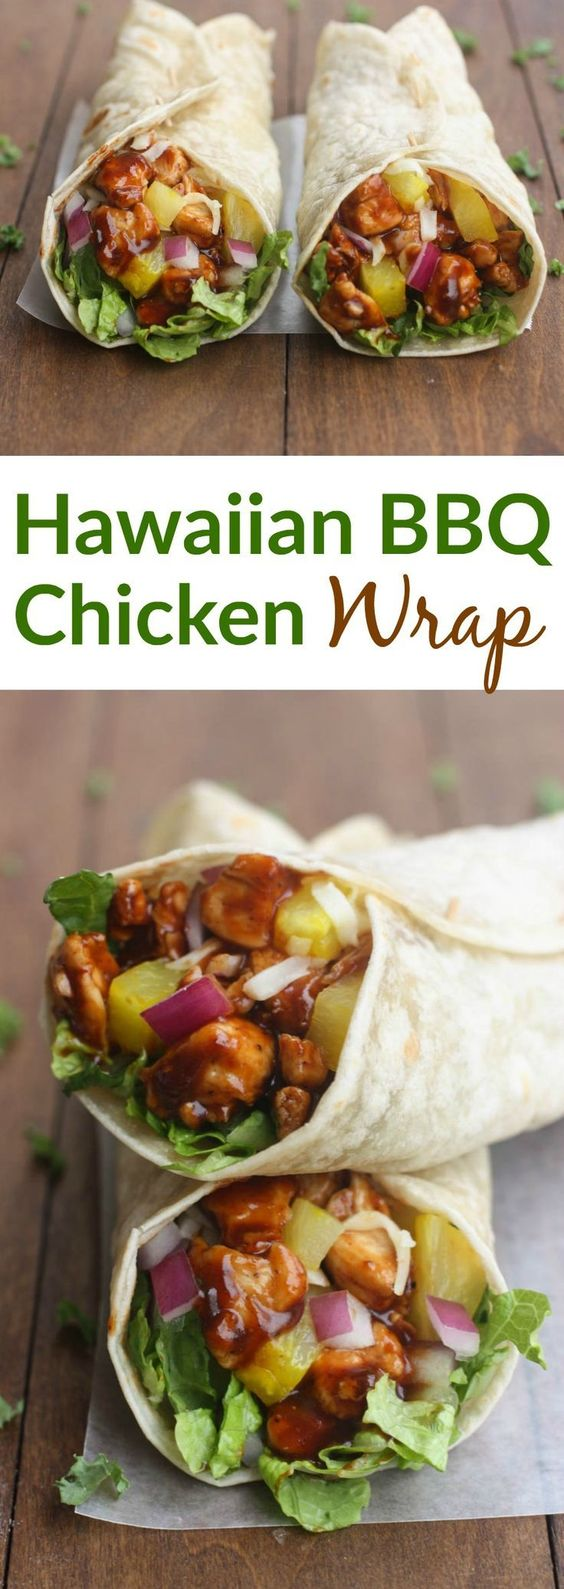 HAWAIIAN BBQ CHICKEN WRAPS #hawaiian #bbq #chiken #chickenrecipes #wraps #dinnerideas #dinnerrecipes #dinner